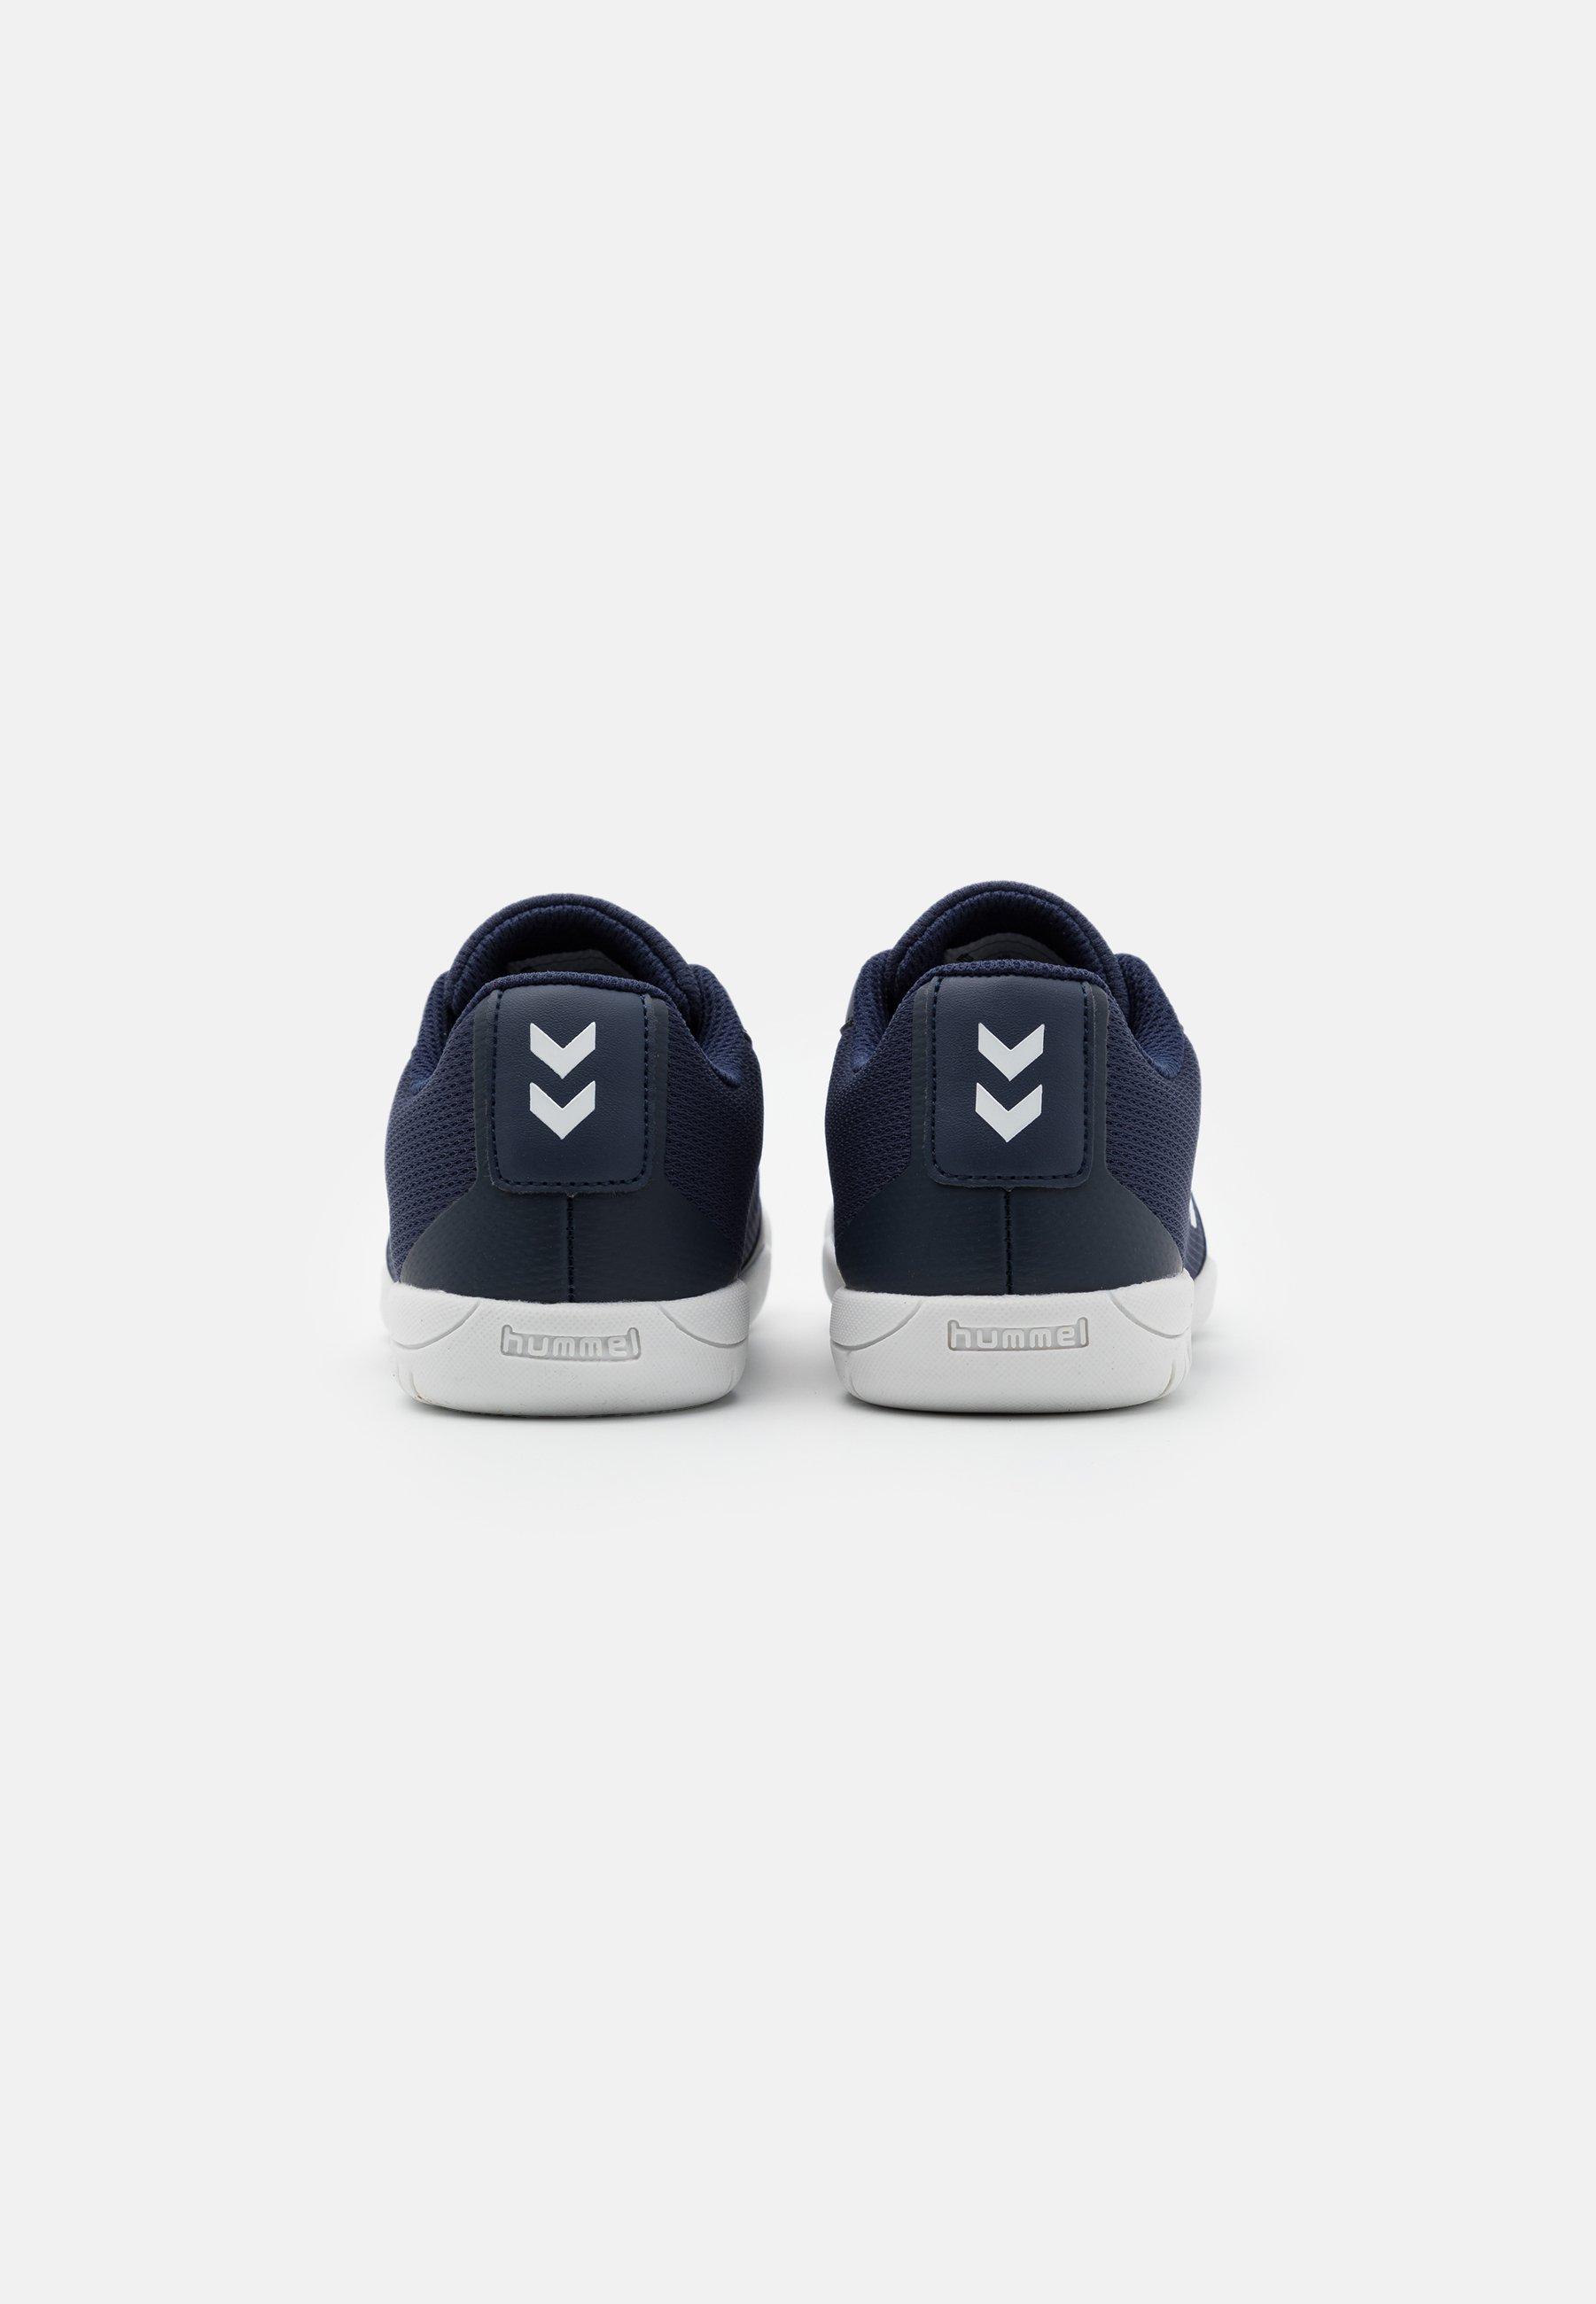 Wholesale Quality Cheapest Hummel AERO TEAM - Handball shoes - peacoat | kids shoes 2020 b3iKd